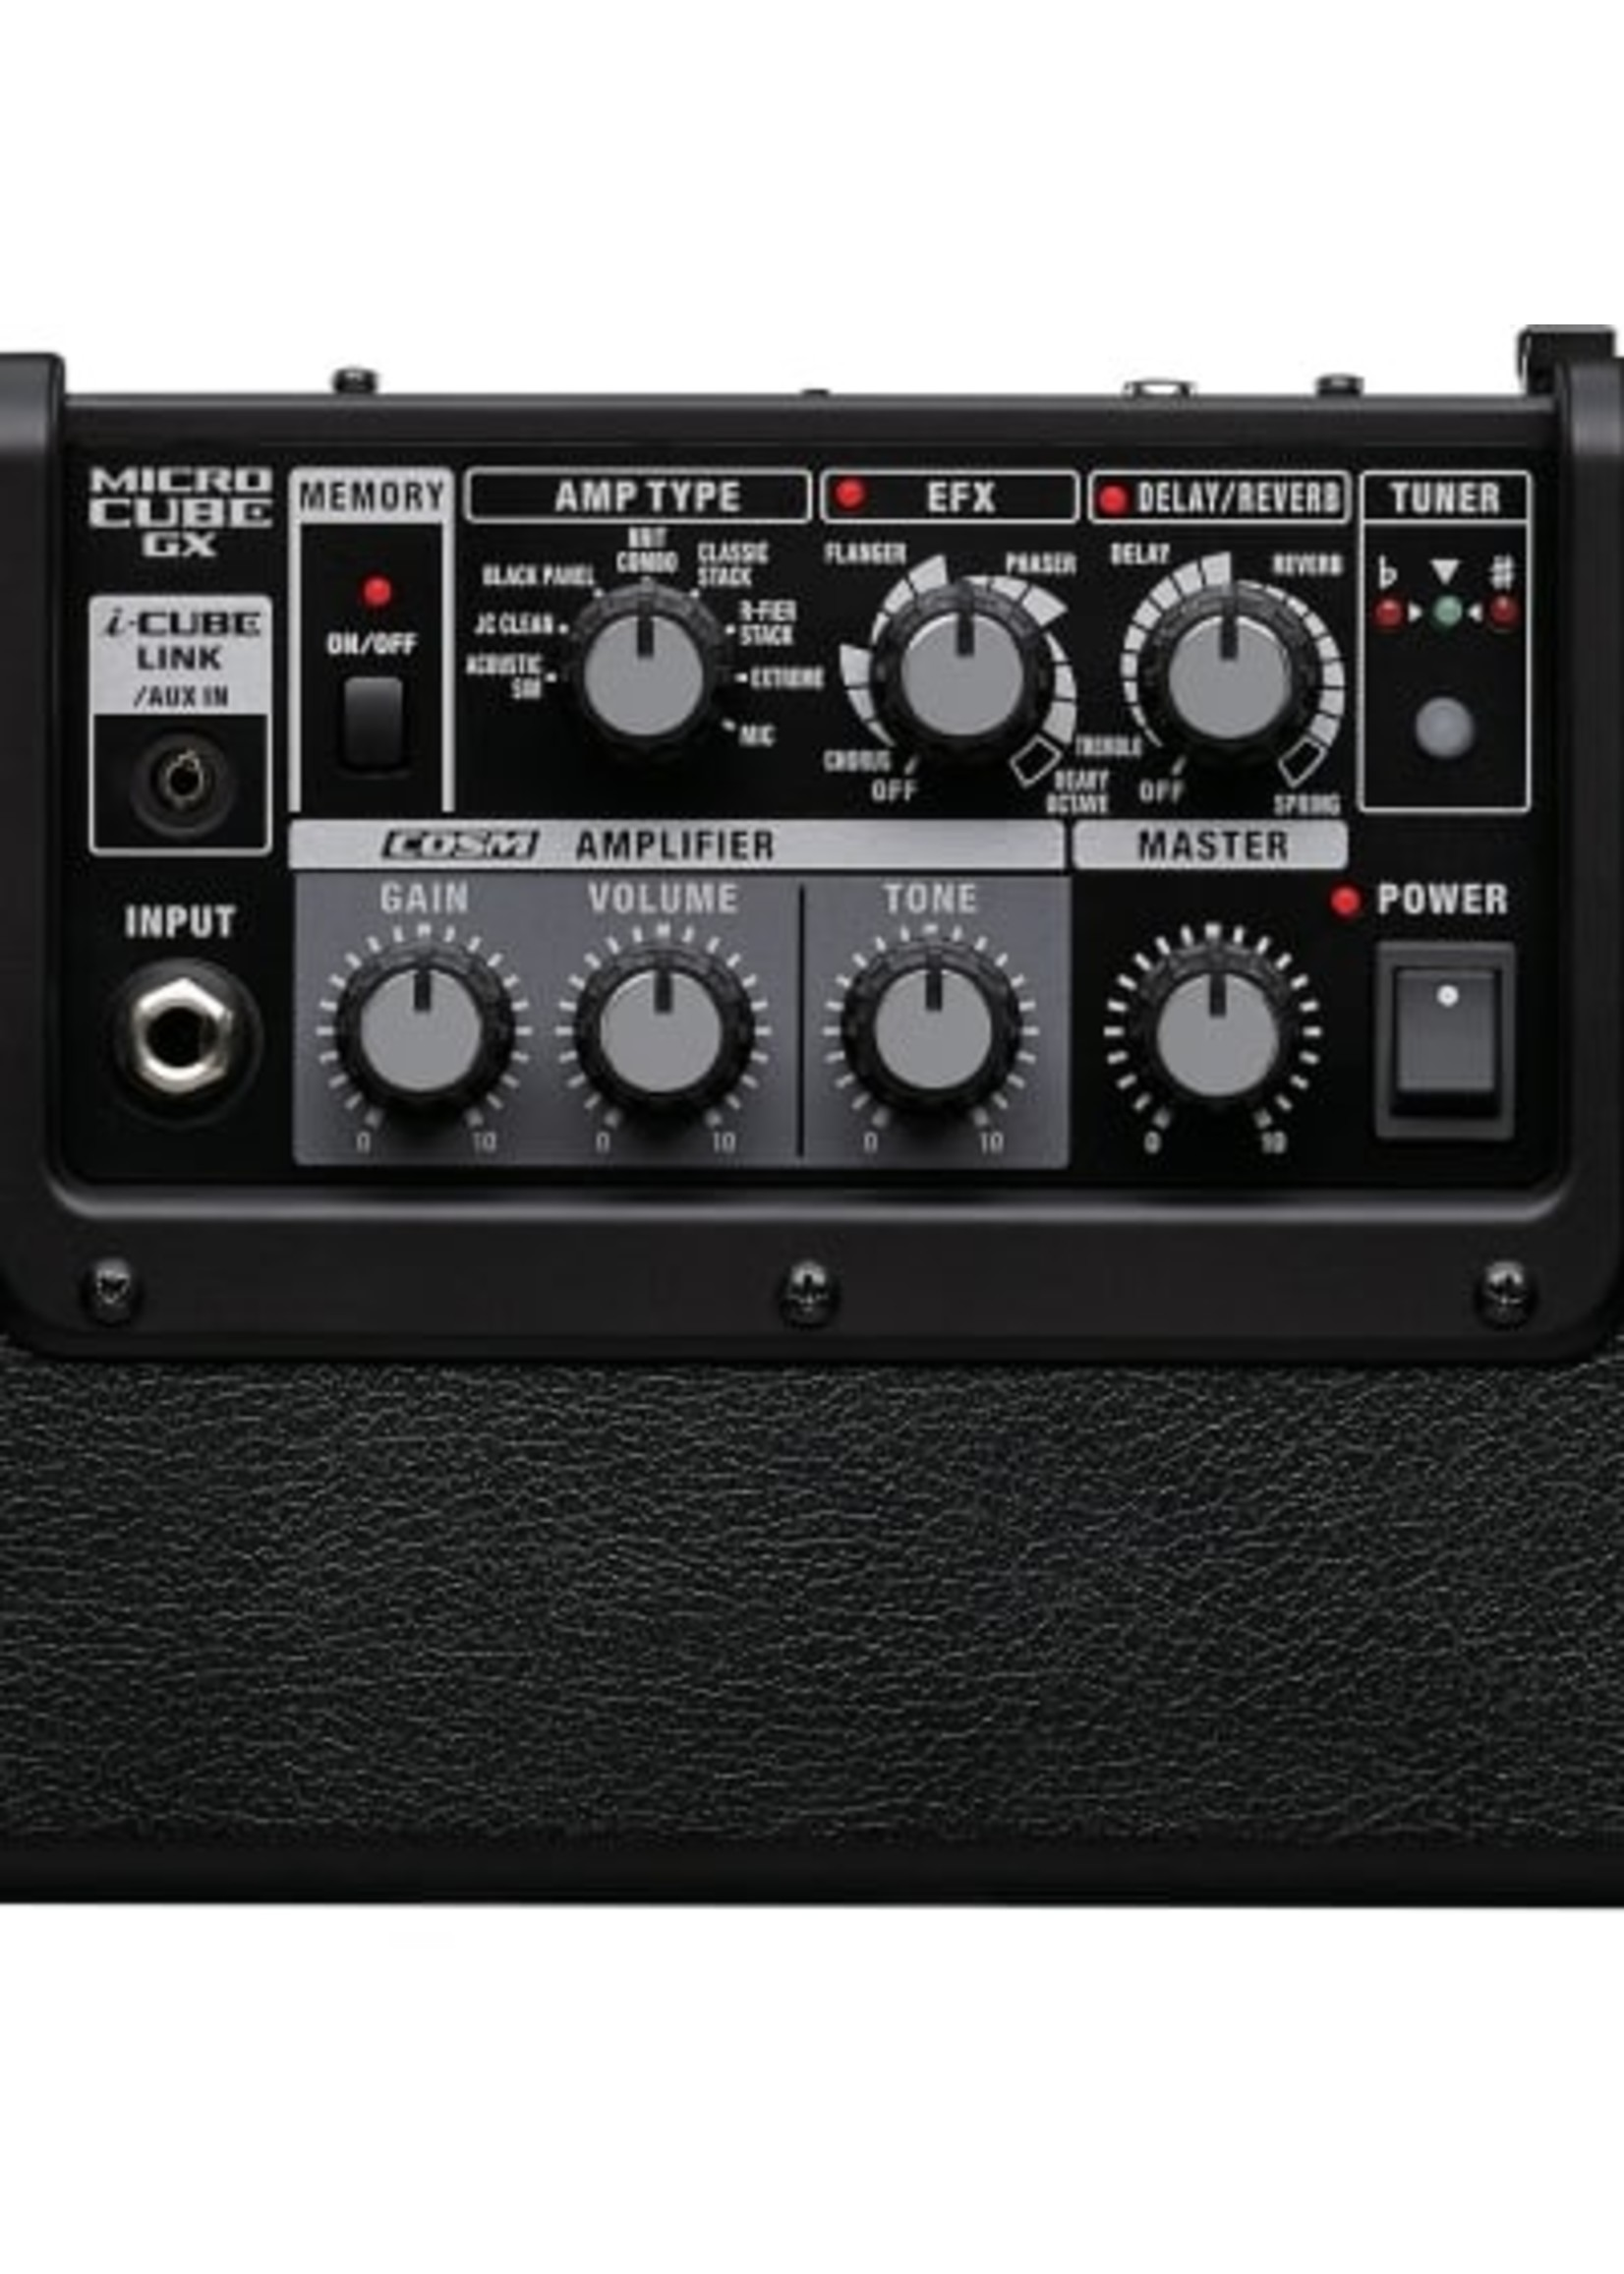 Roland Roland M-CUBE-GX Micro Cube Guitar Amp Black